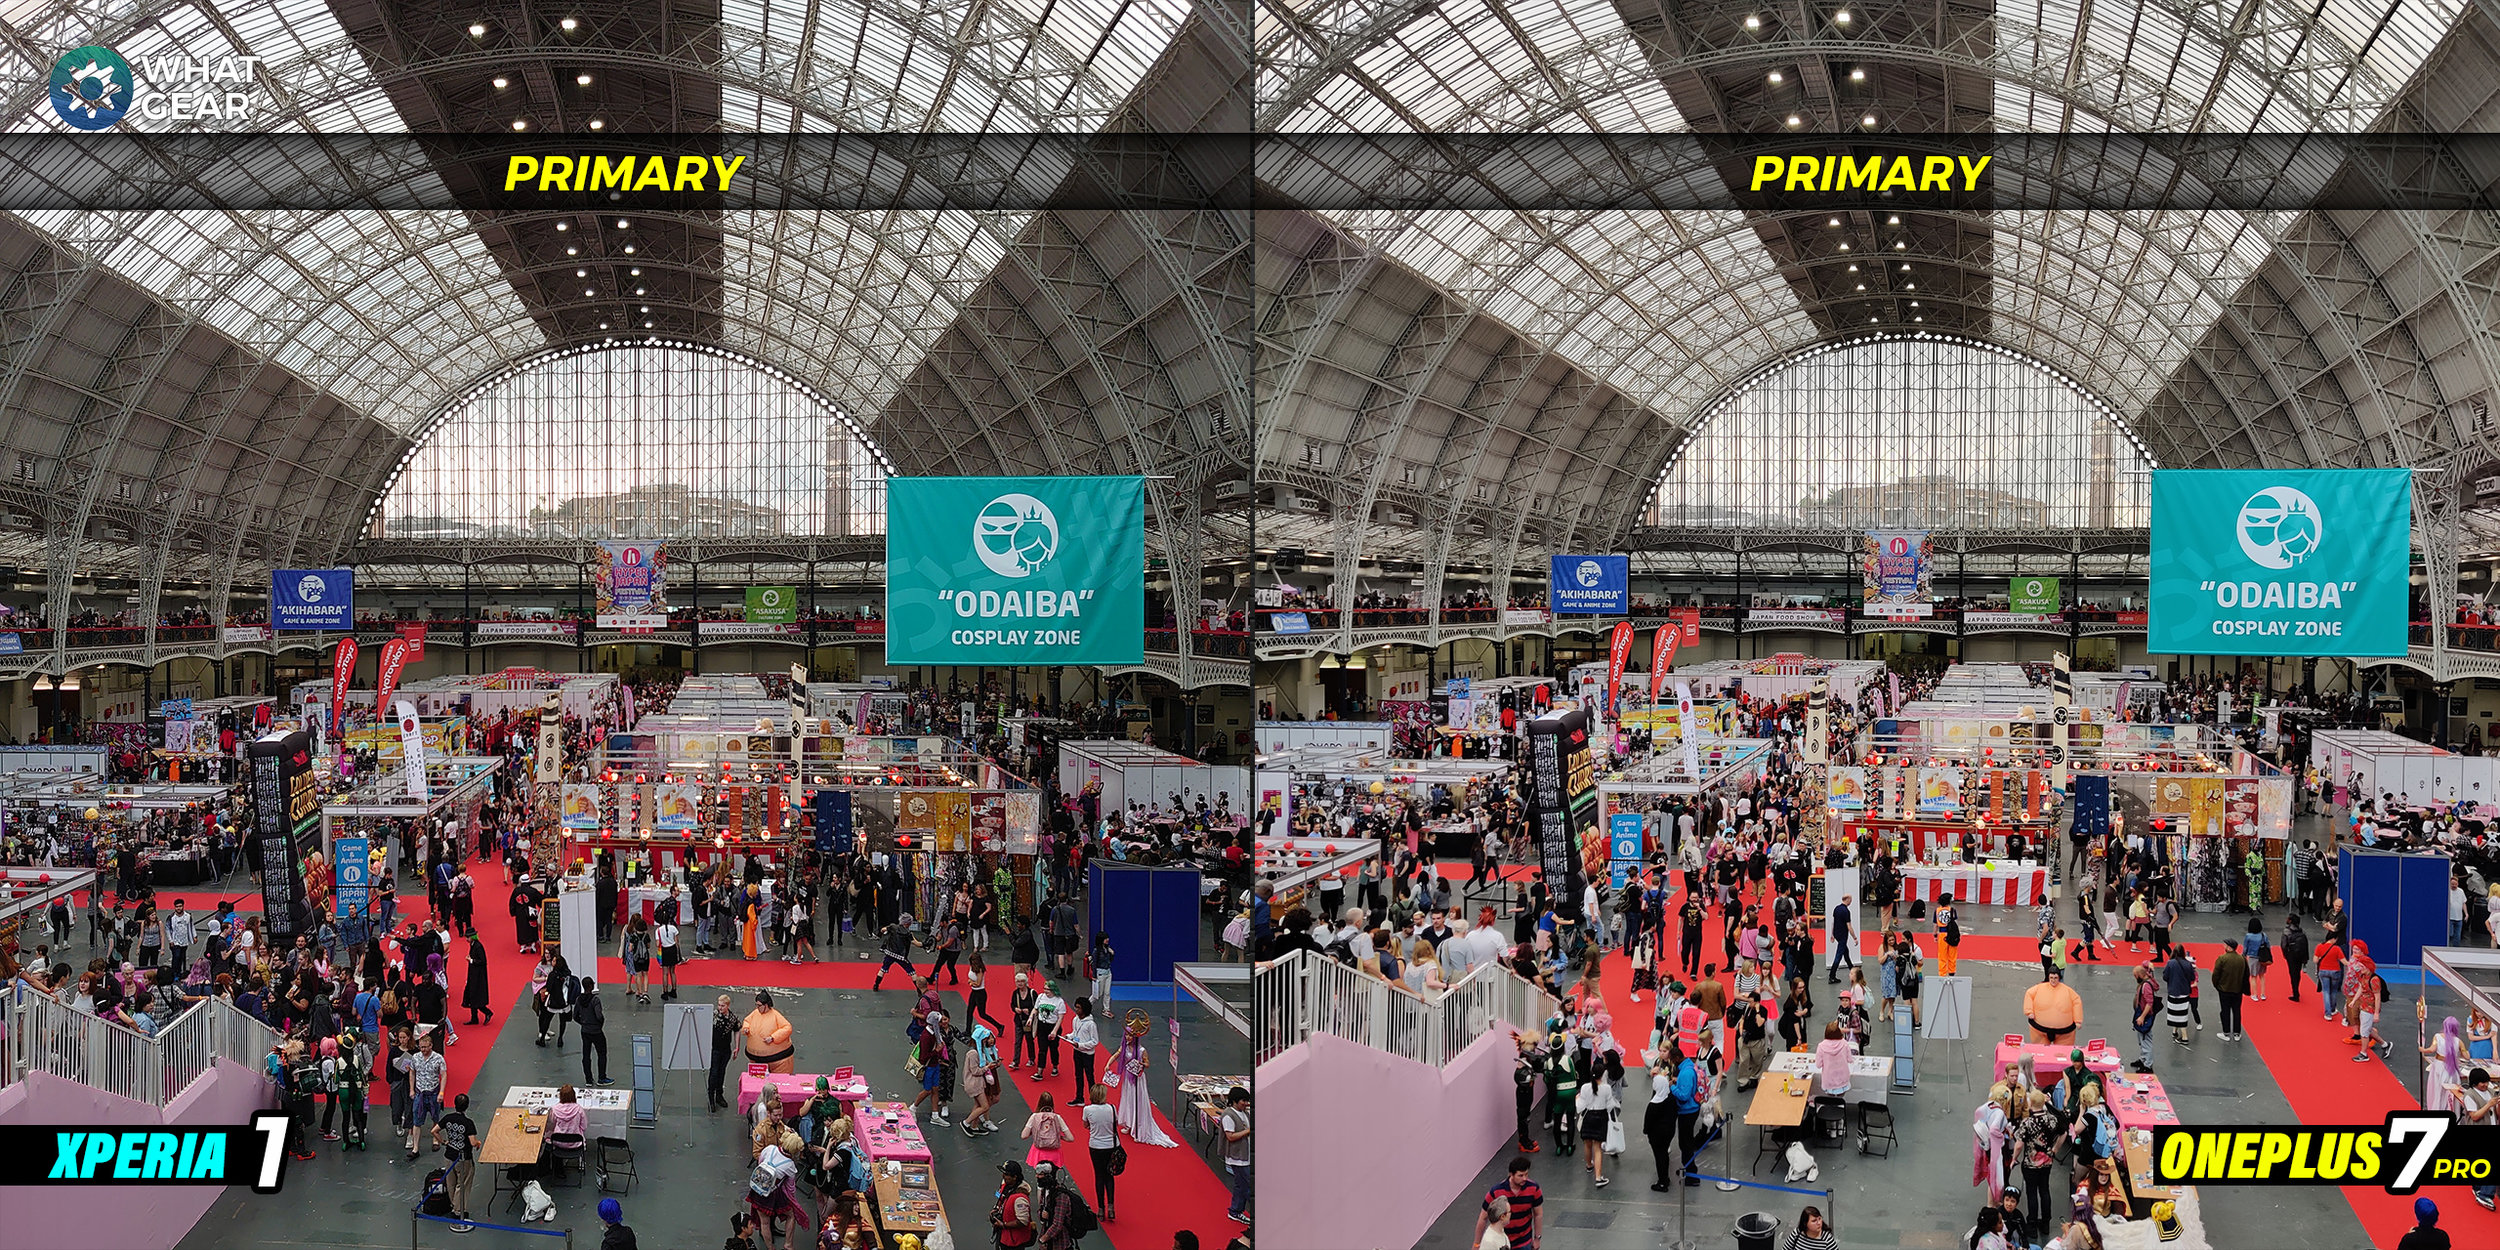 sony xperia 1 vs oneplus 7 pro camera 10.jpg